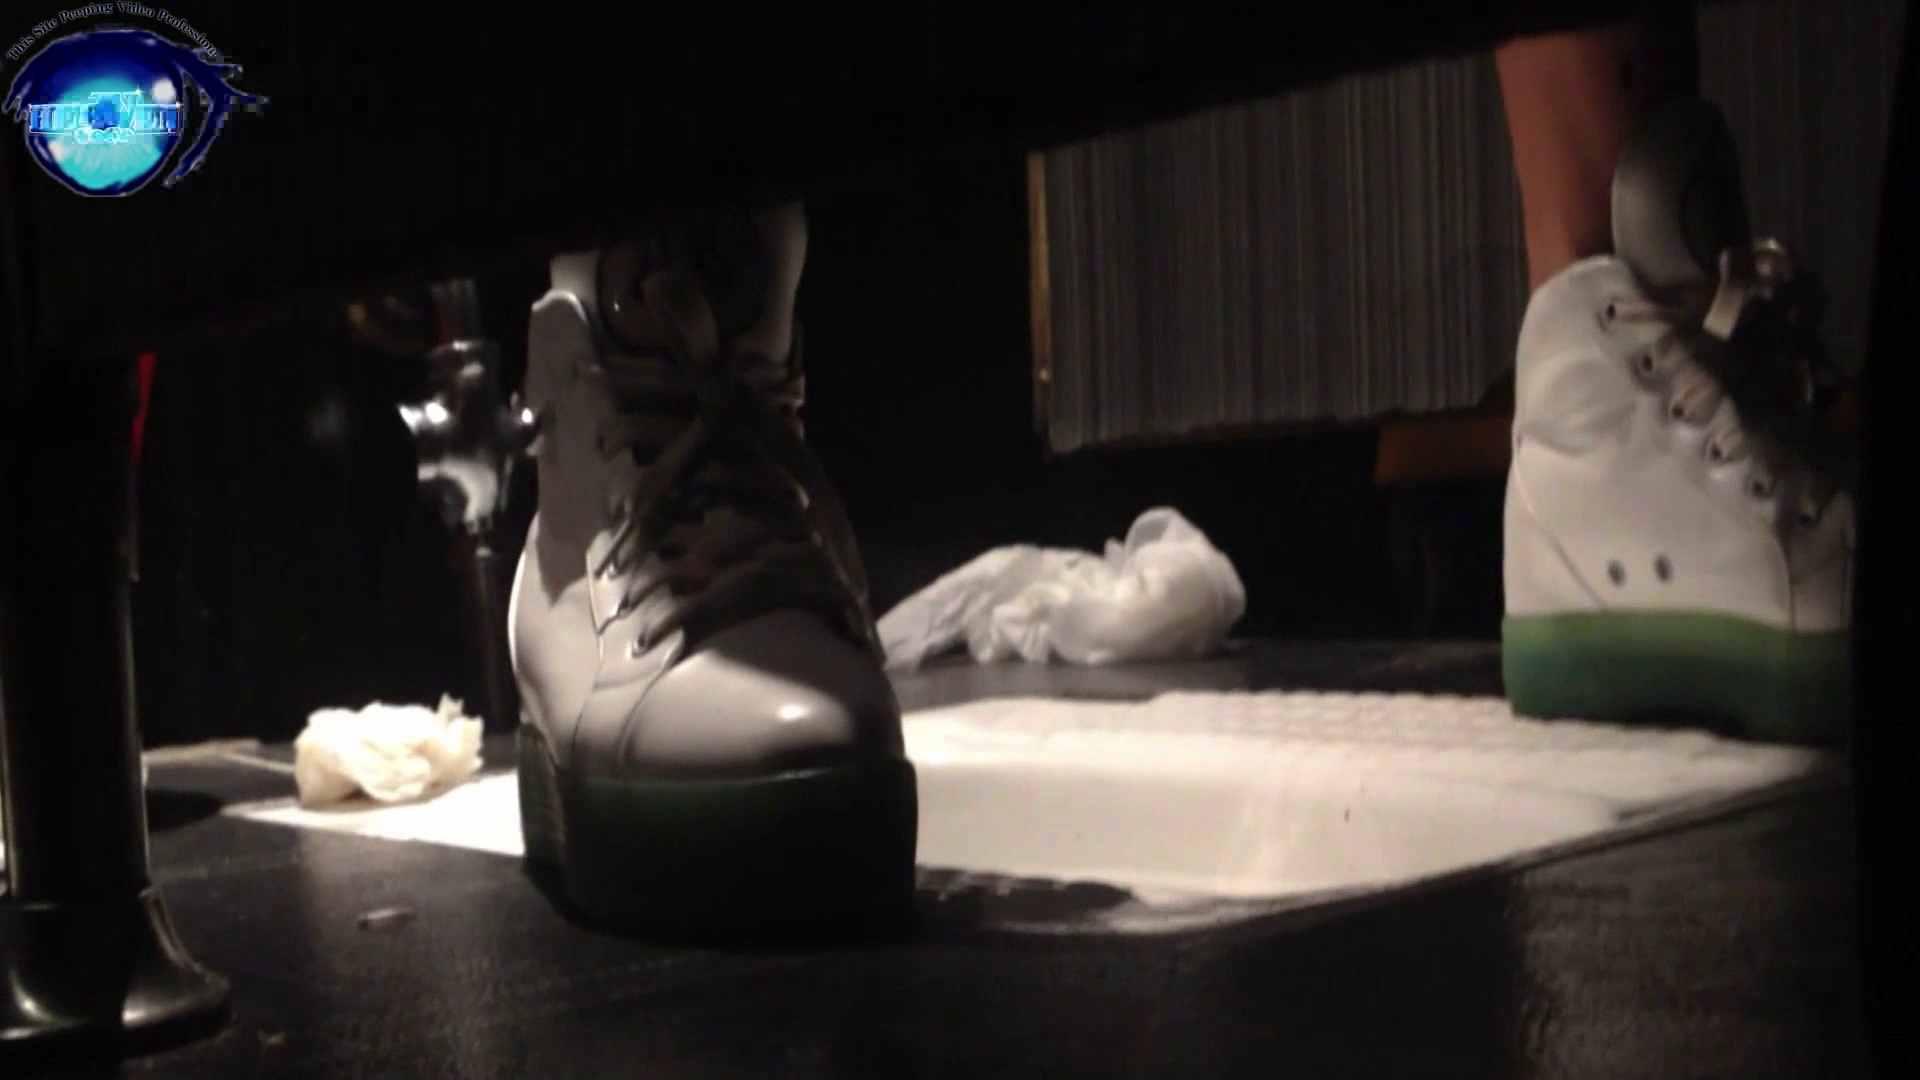 GOD HAND ファッションショッピングセンター盗撮vol.02前編 高画質 | OLのエロ生活  74連発 34